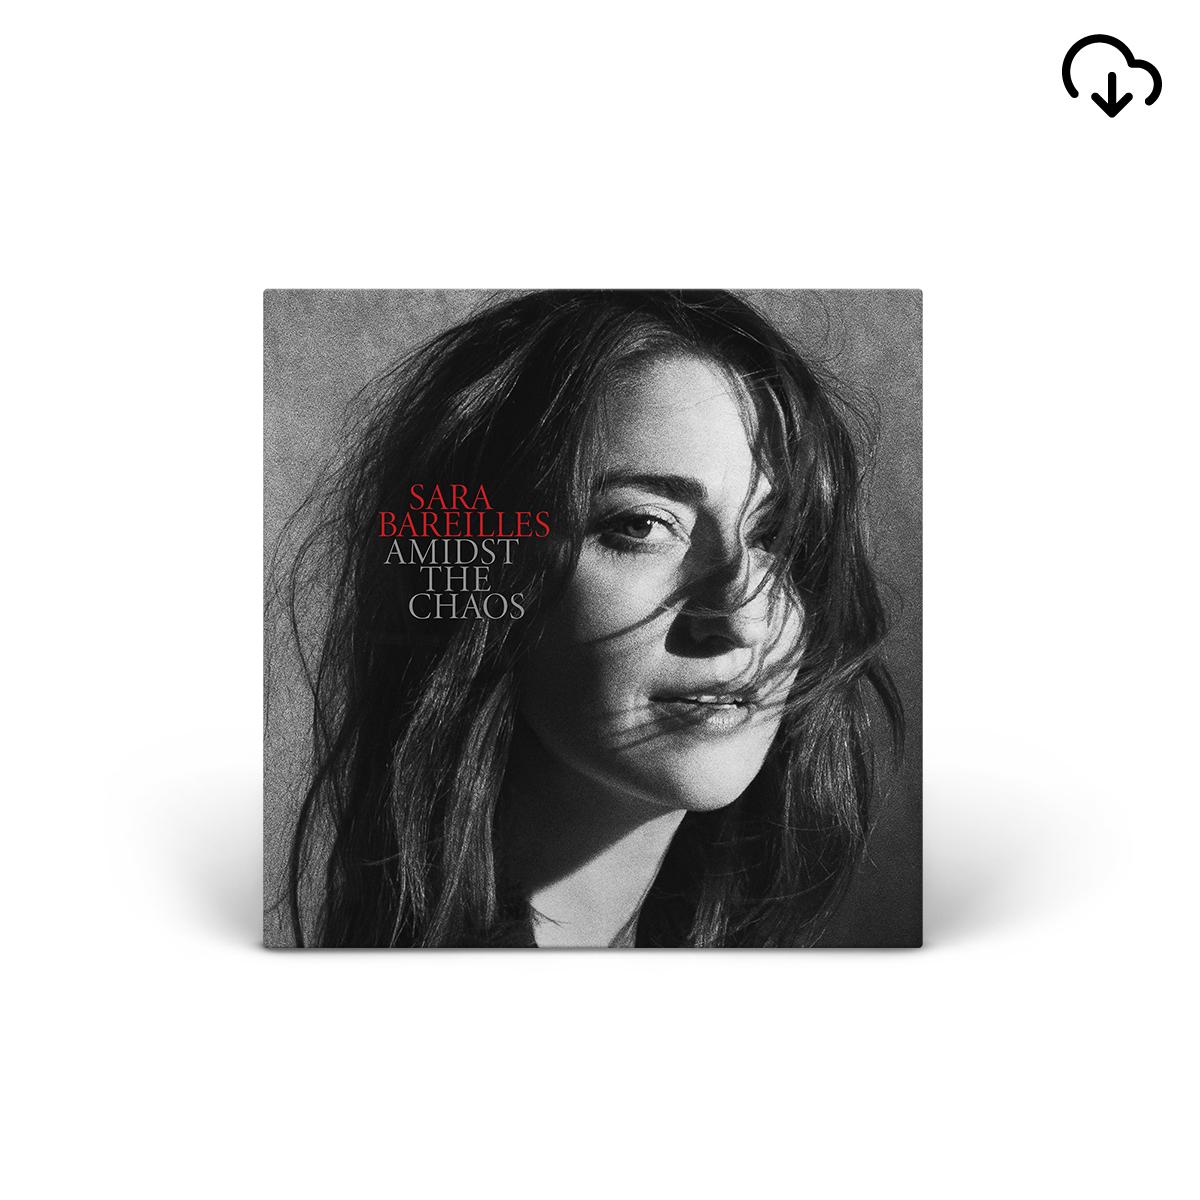 Sara Bareilles - Amidst The Chaos Digital Download